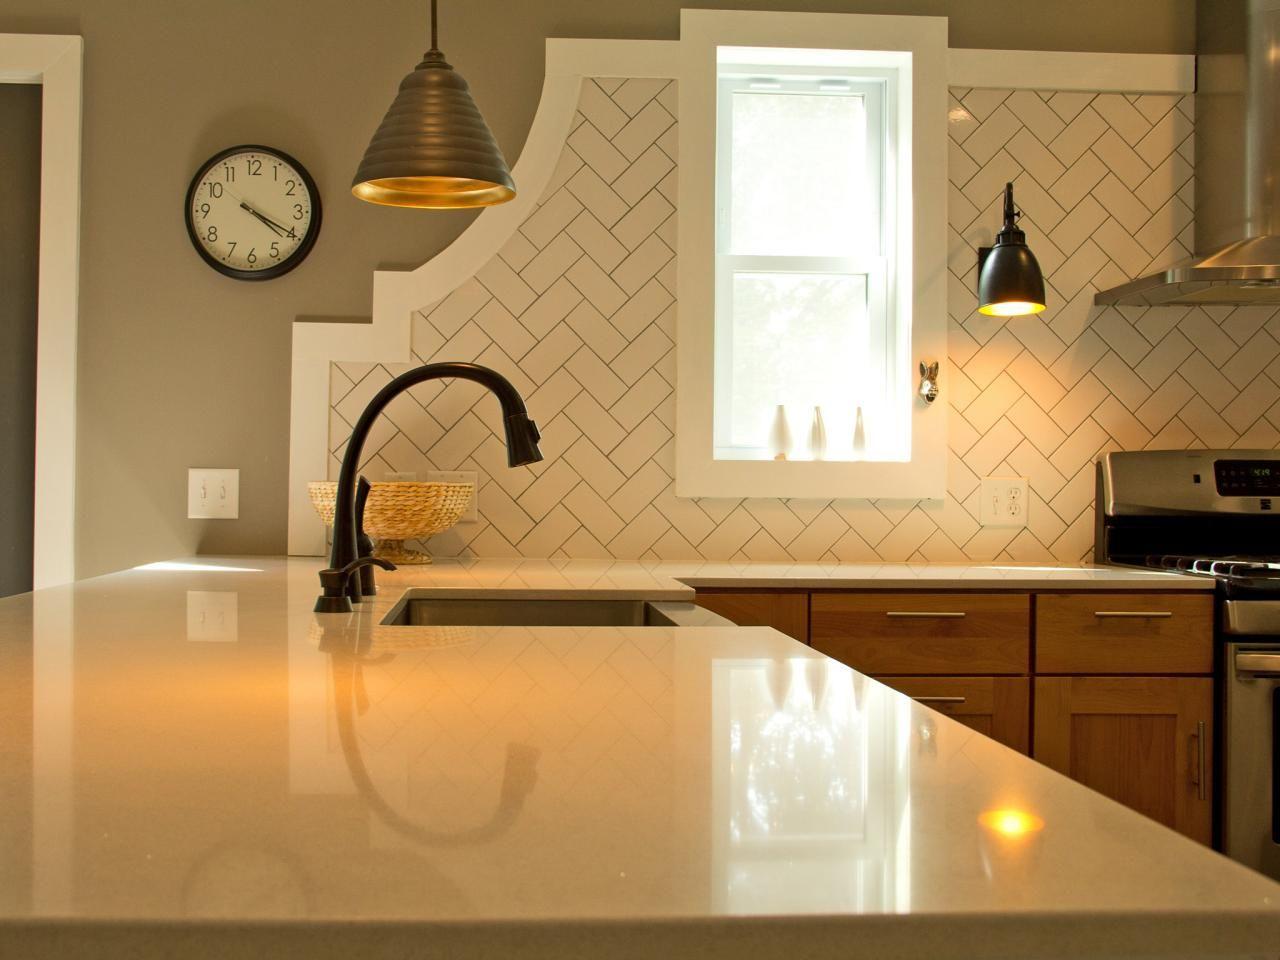 30 Trendiest Kitchen Backsplash Materials   Herringbone pattern ...